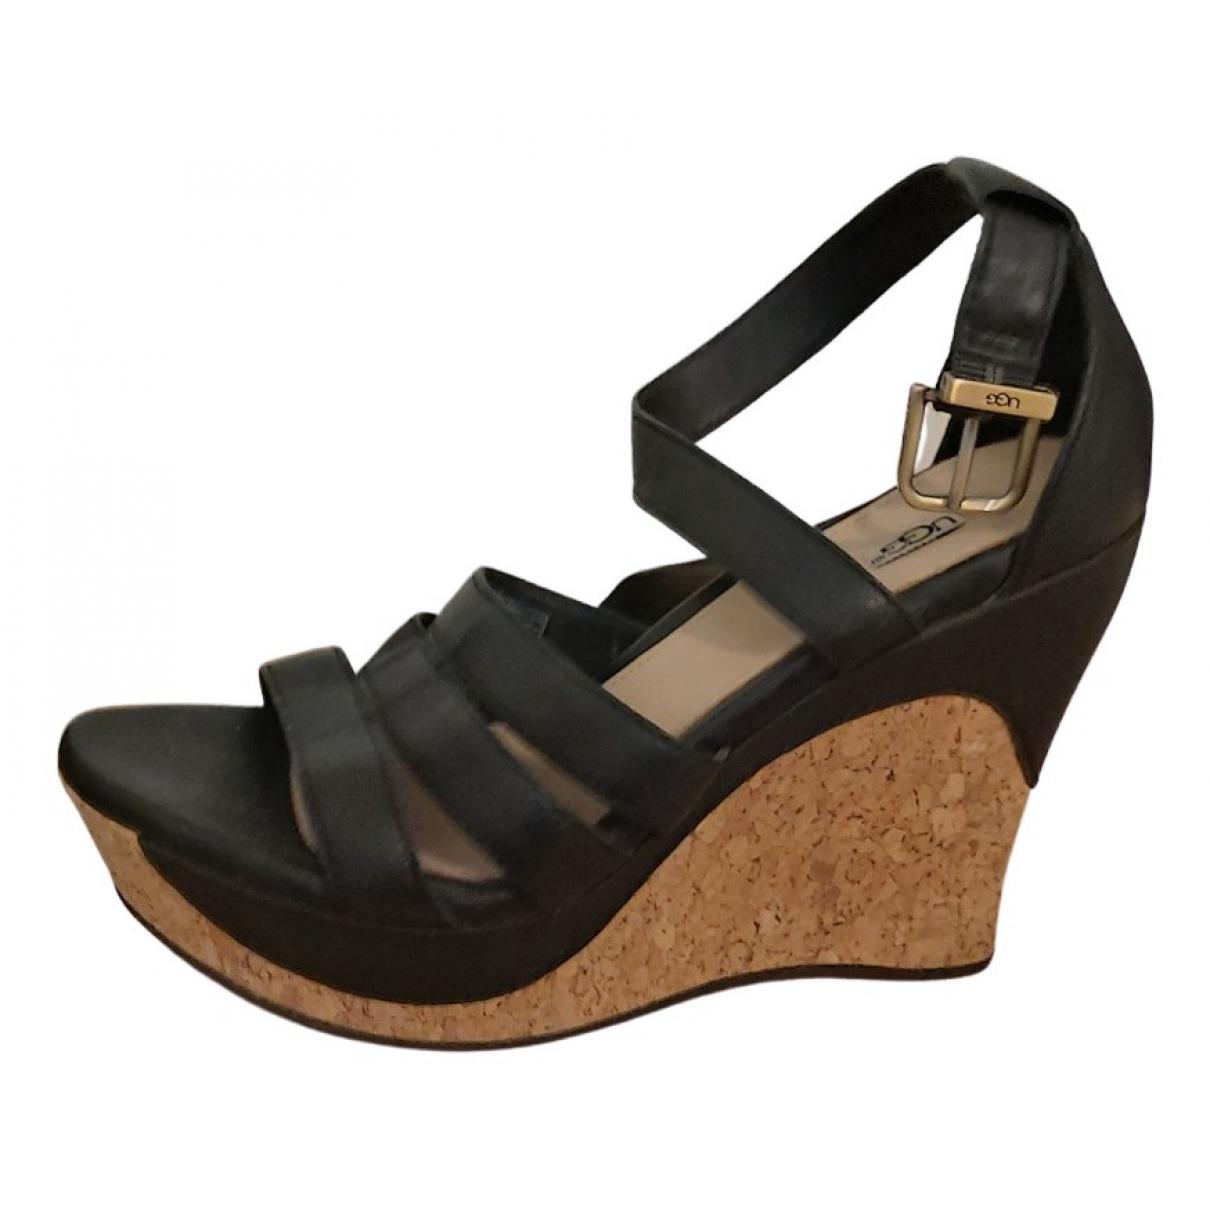 Ugg N Black Leather Heels for Women 37 EU